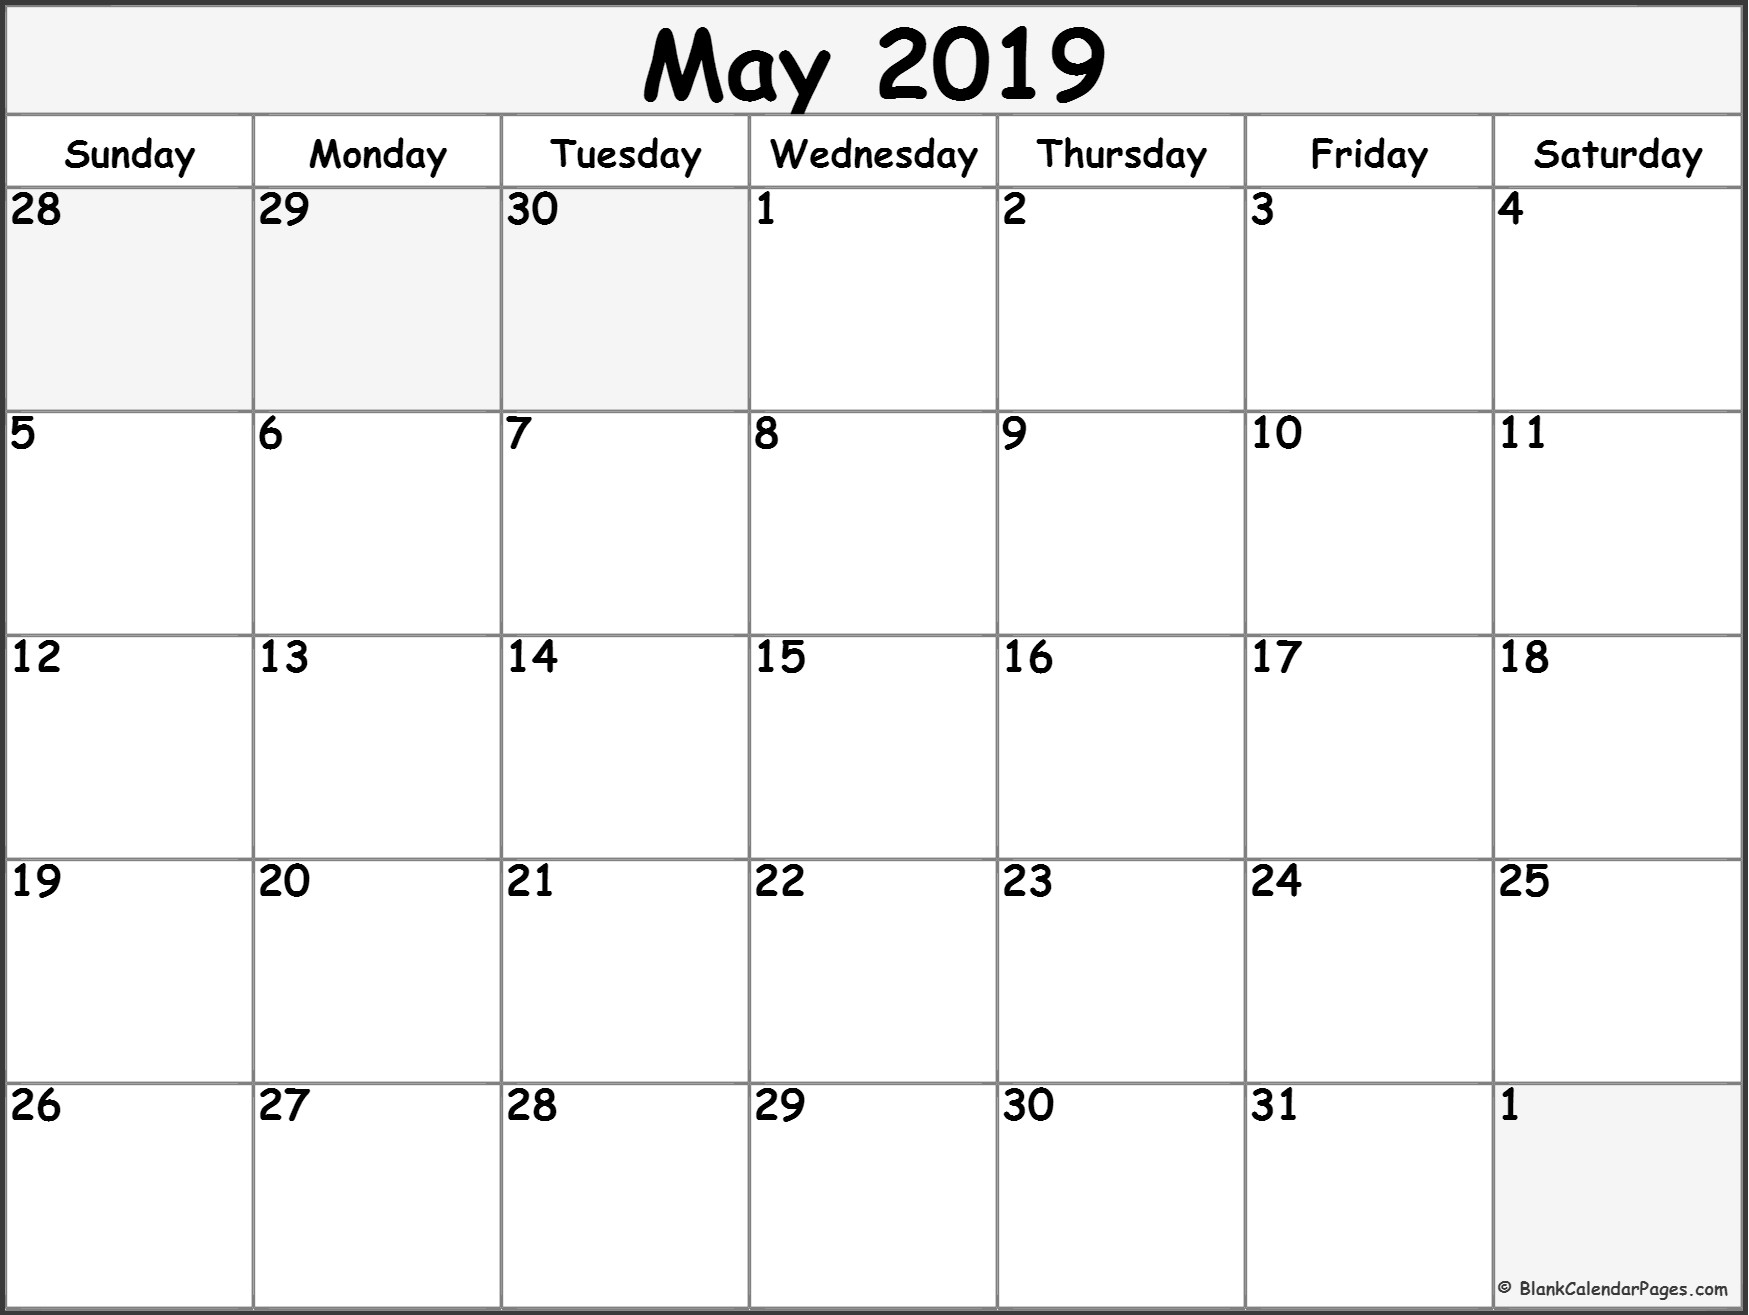 Calendar May 2019 6 | Stln May 6 2019 Calendar